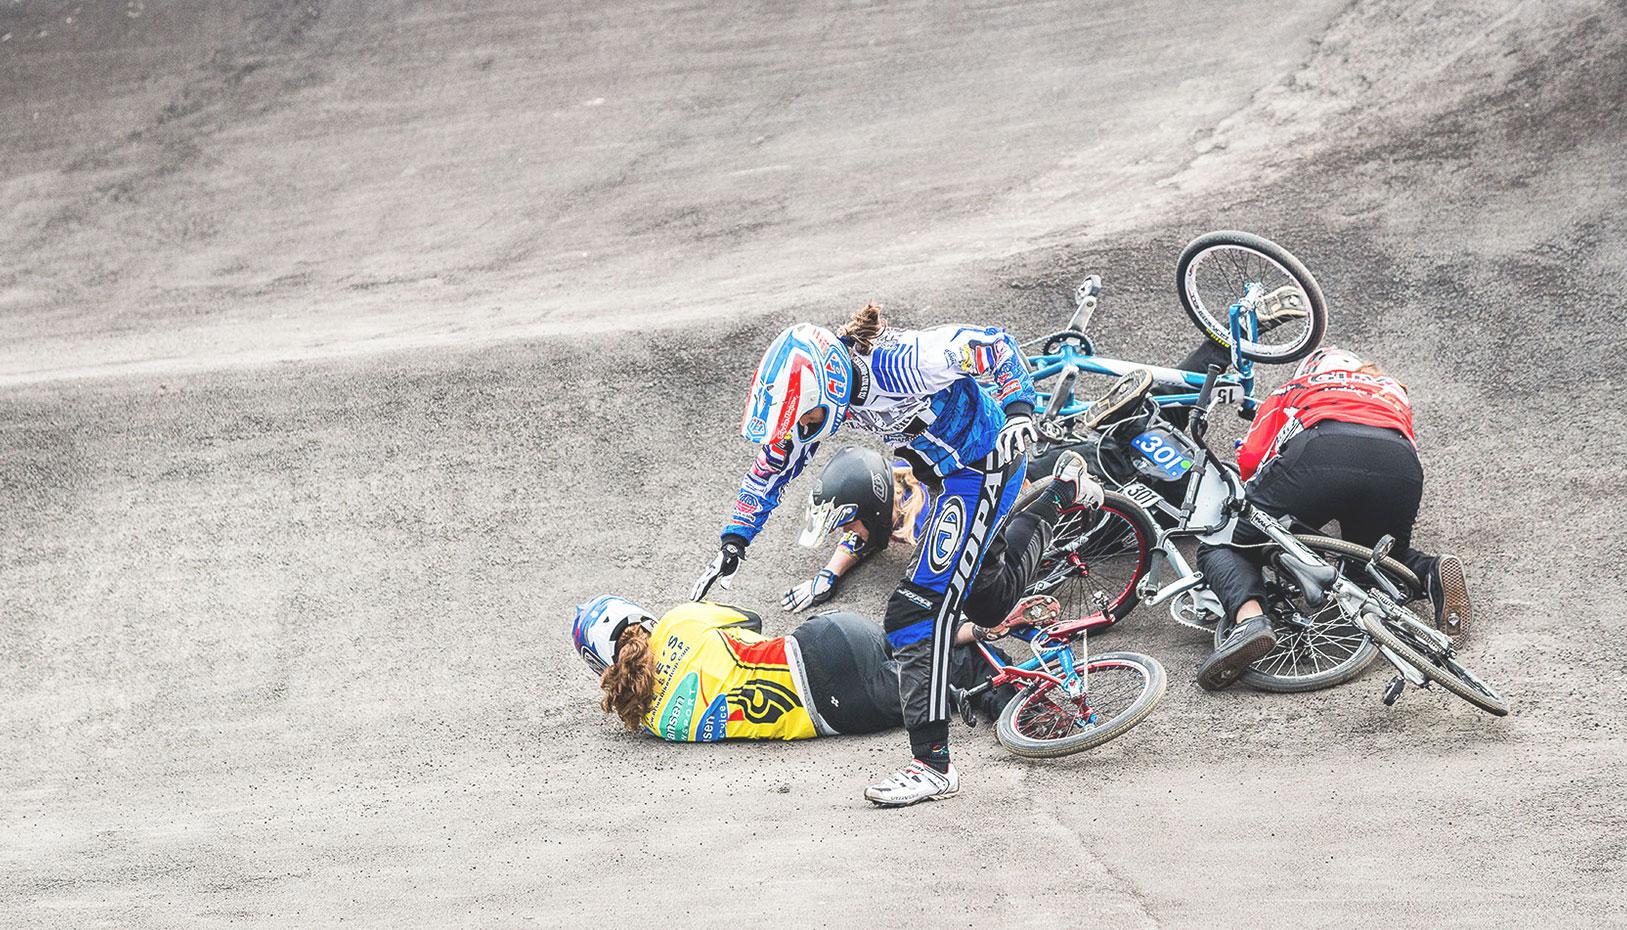 Sport_landing